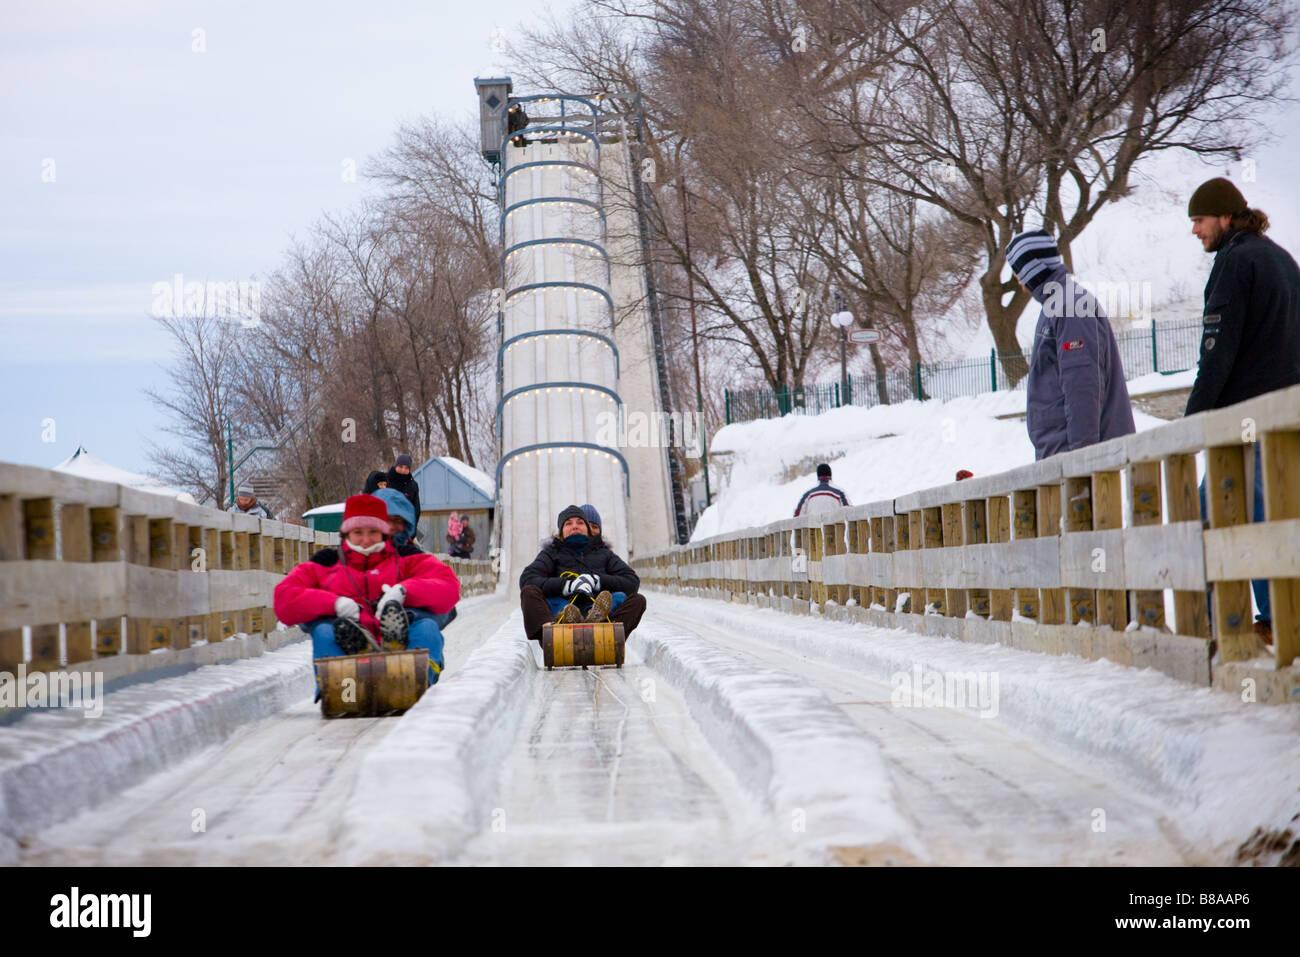 Toboggan slide at Terrasse Dufferin Old Town Quebec City Canada - Stock Image